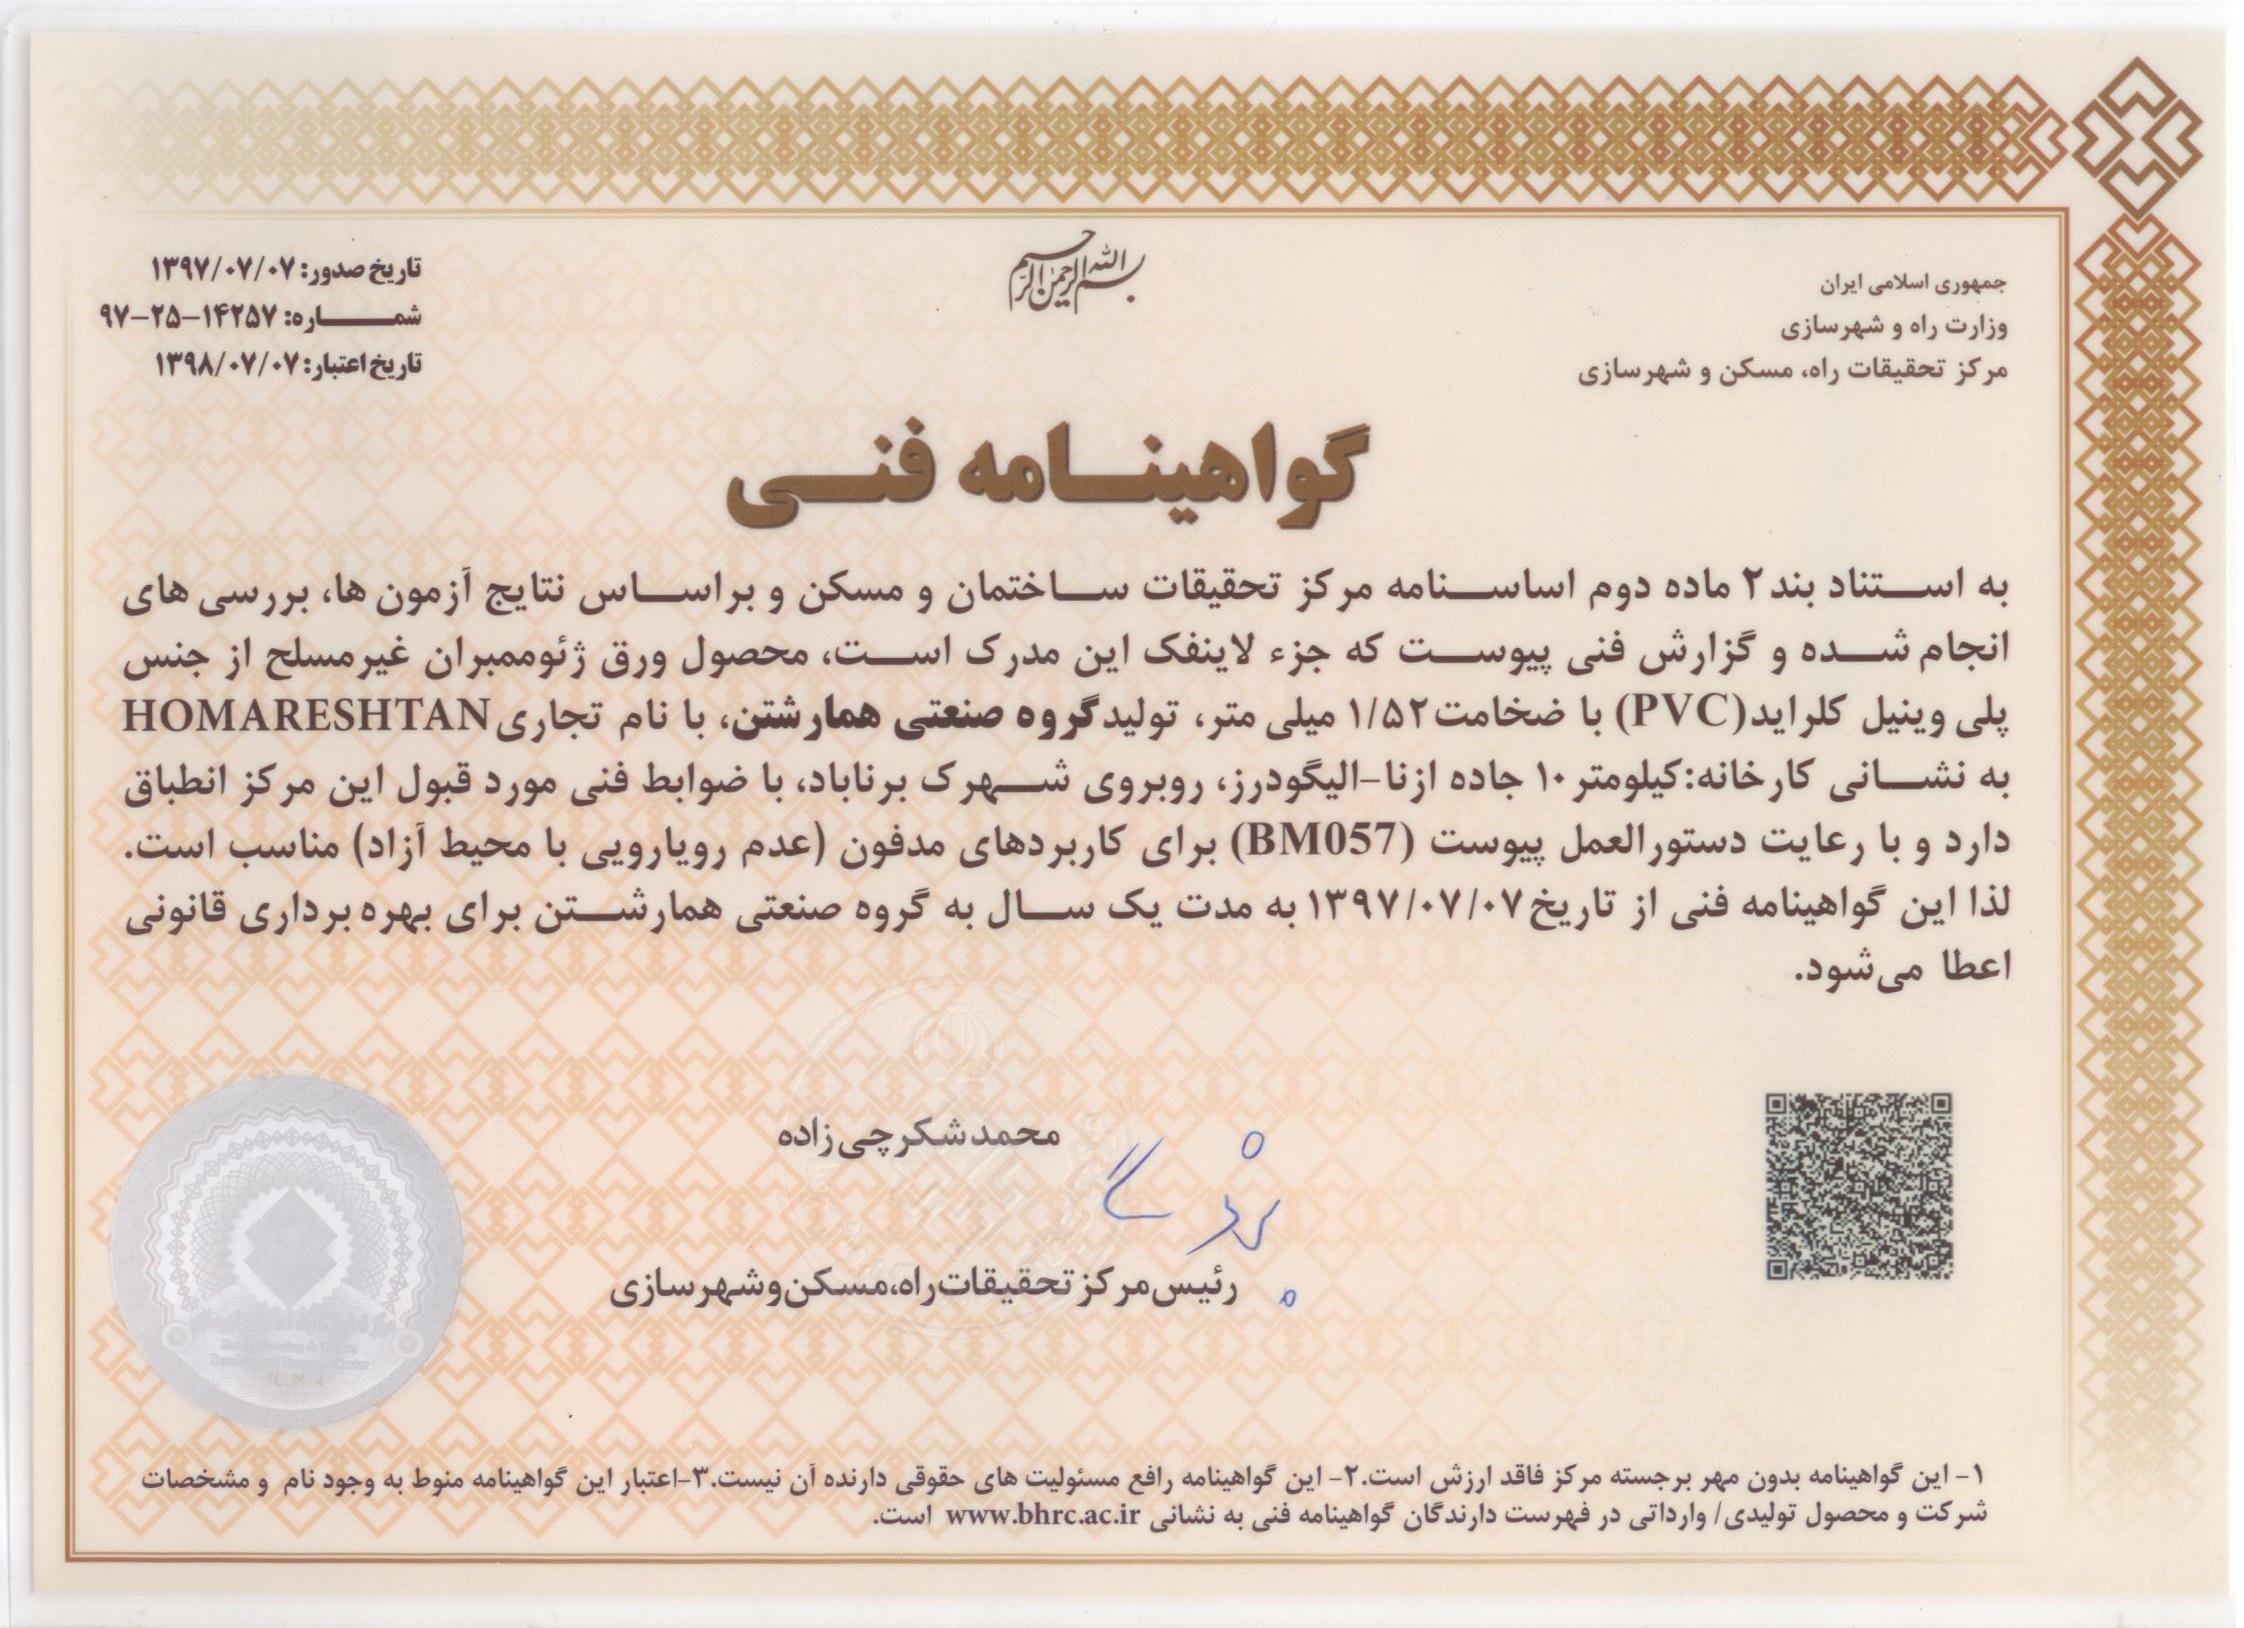 homarestan-geomembran-certificate